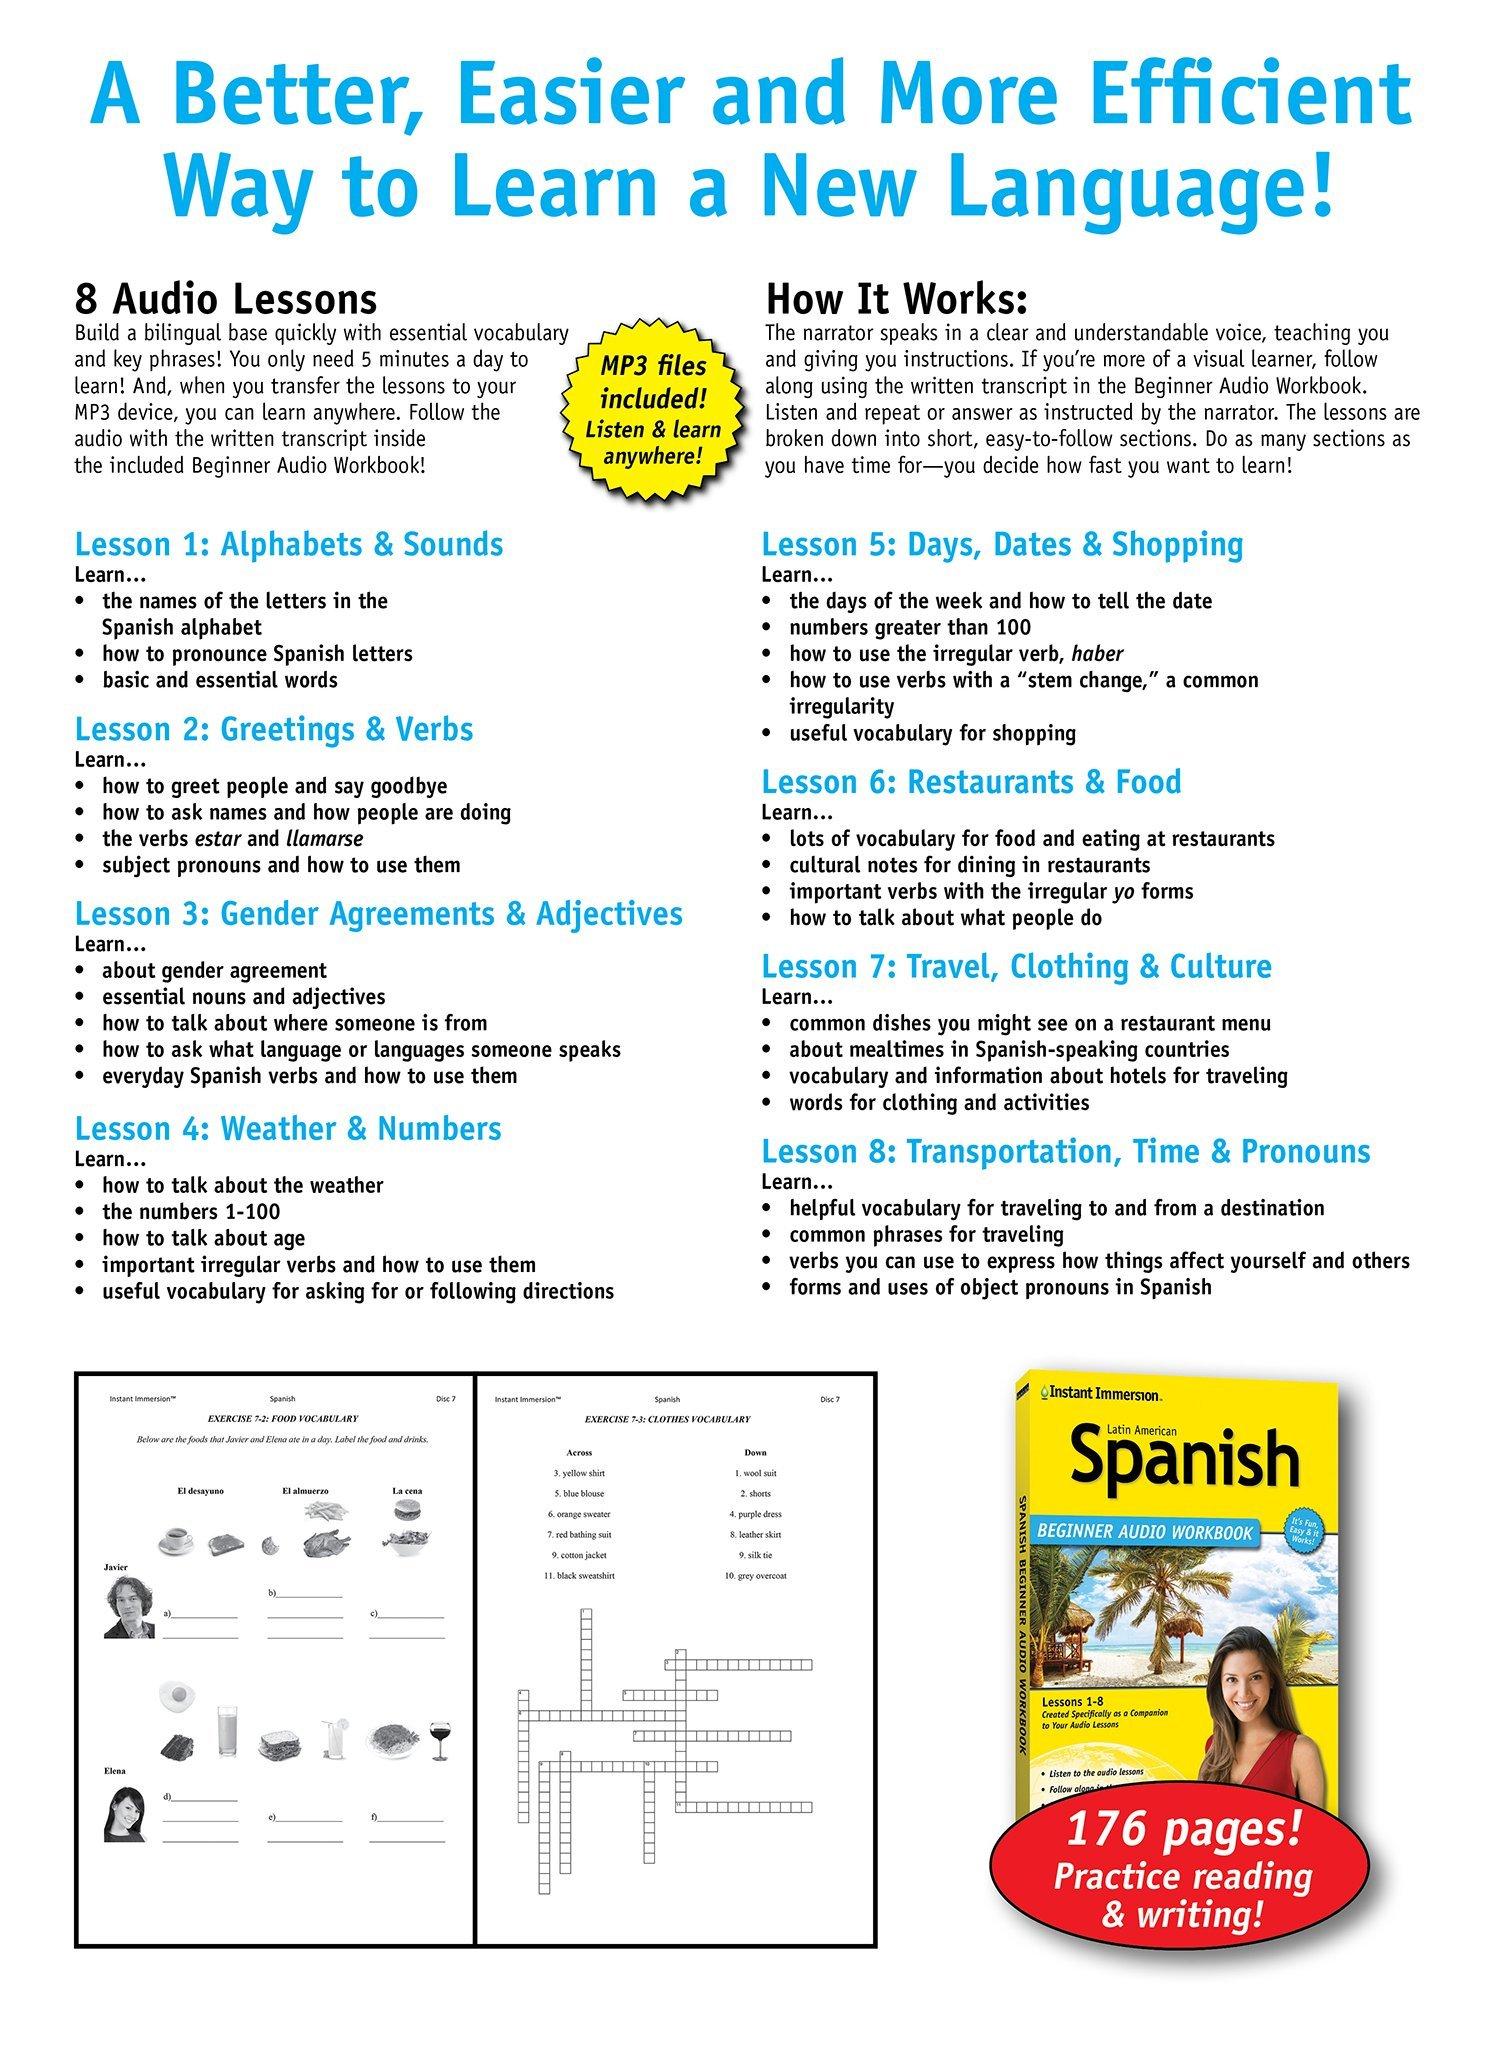 Learn latin american spanish beginner audio language course by learn latin american spanish beginner audio language course by instant immersion 2016 version spanish edition instant immersion 9781618945426 kristyandbryce Choice Image